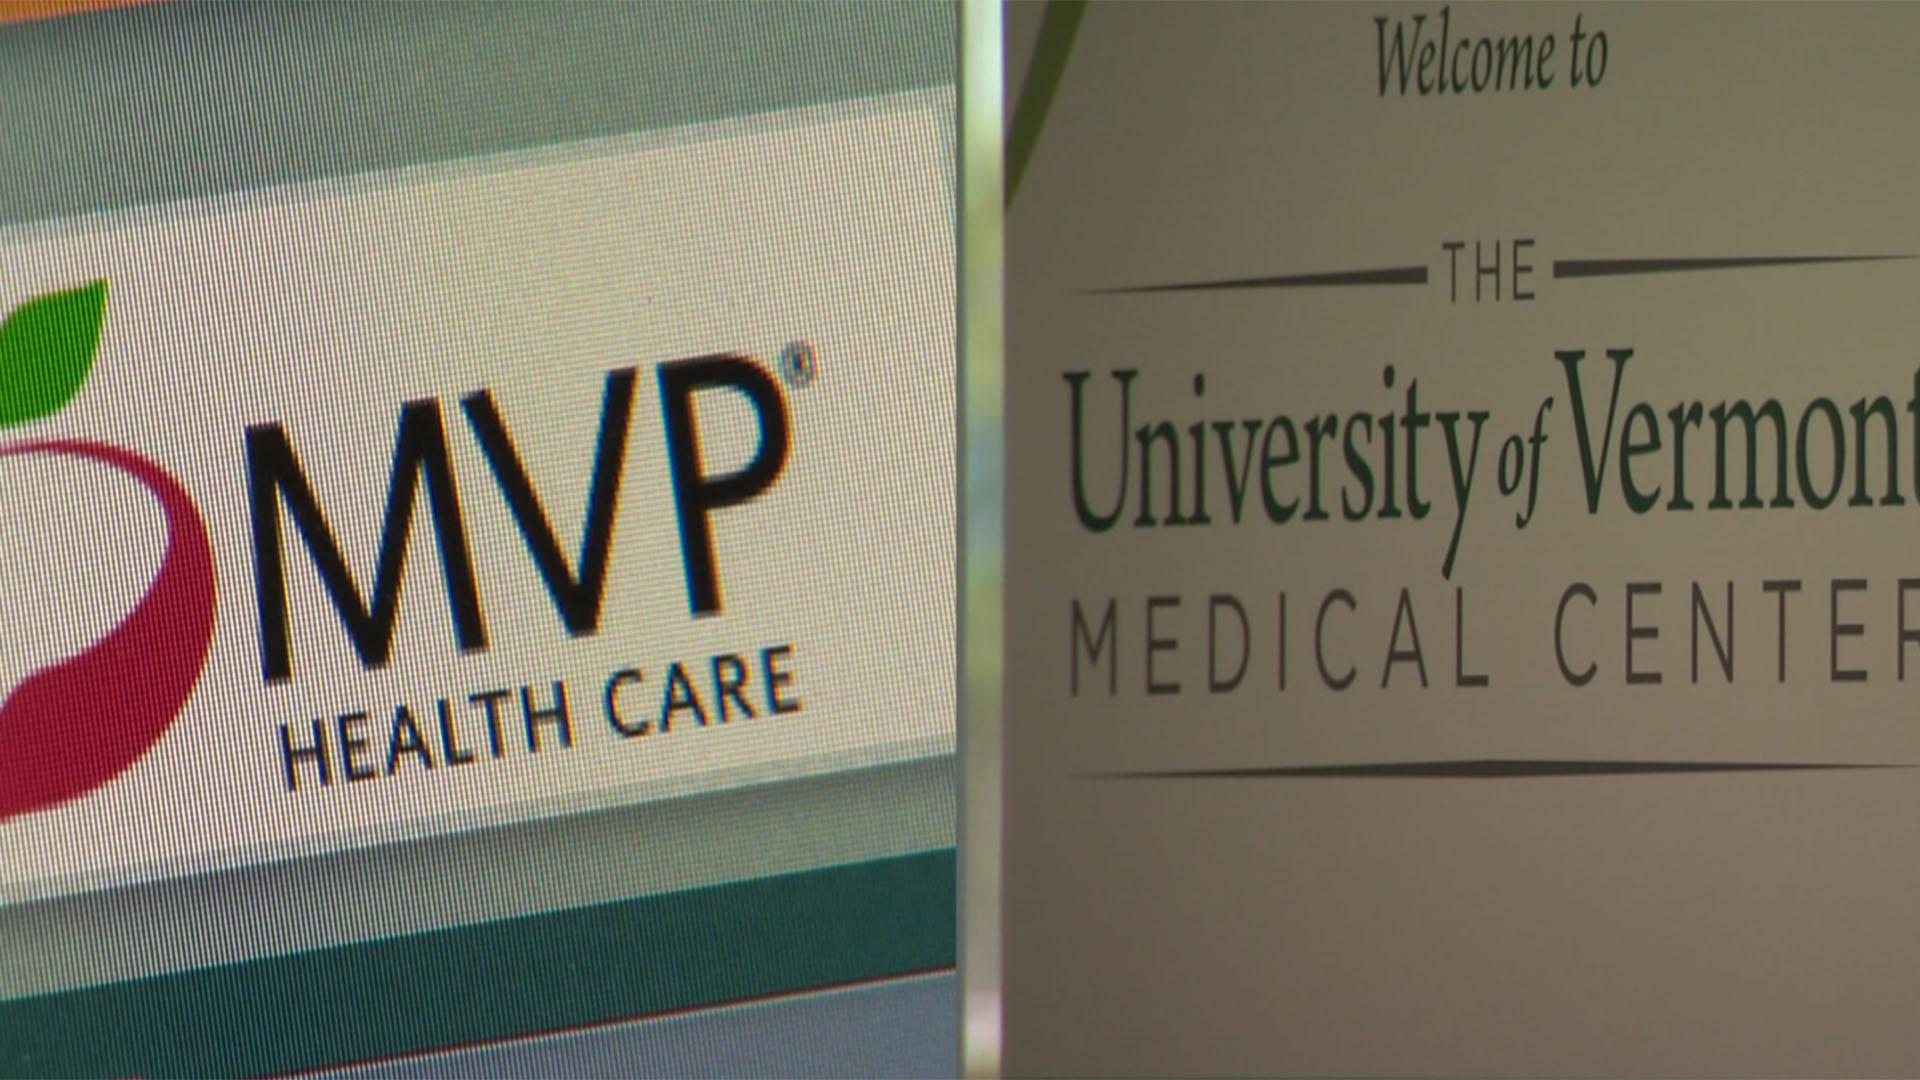 Uvm Calendar 2022.Mvp Health Care Uvm Health Network Team Up On New Health Plan